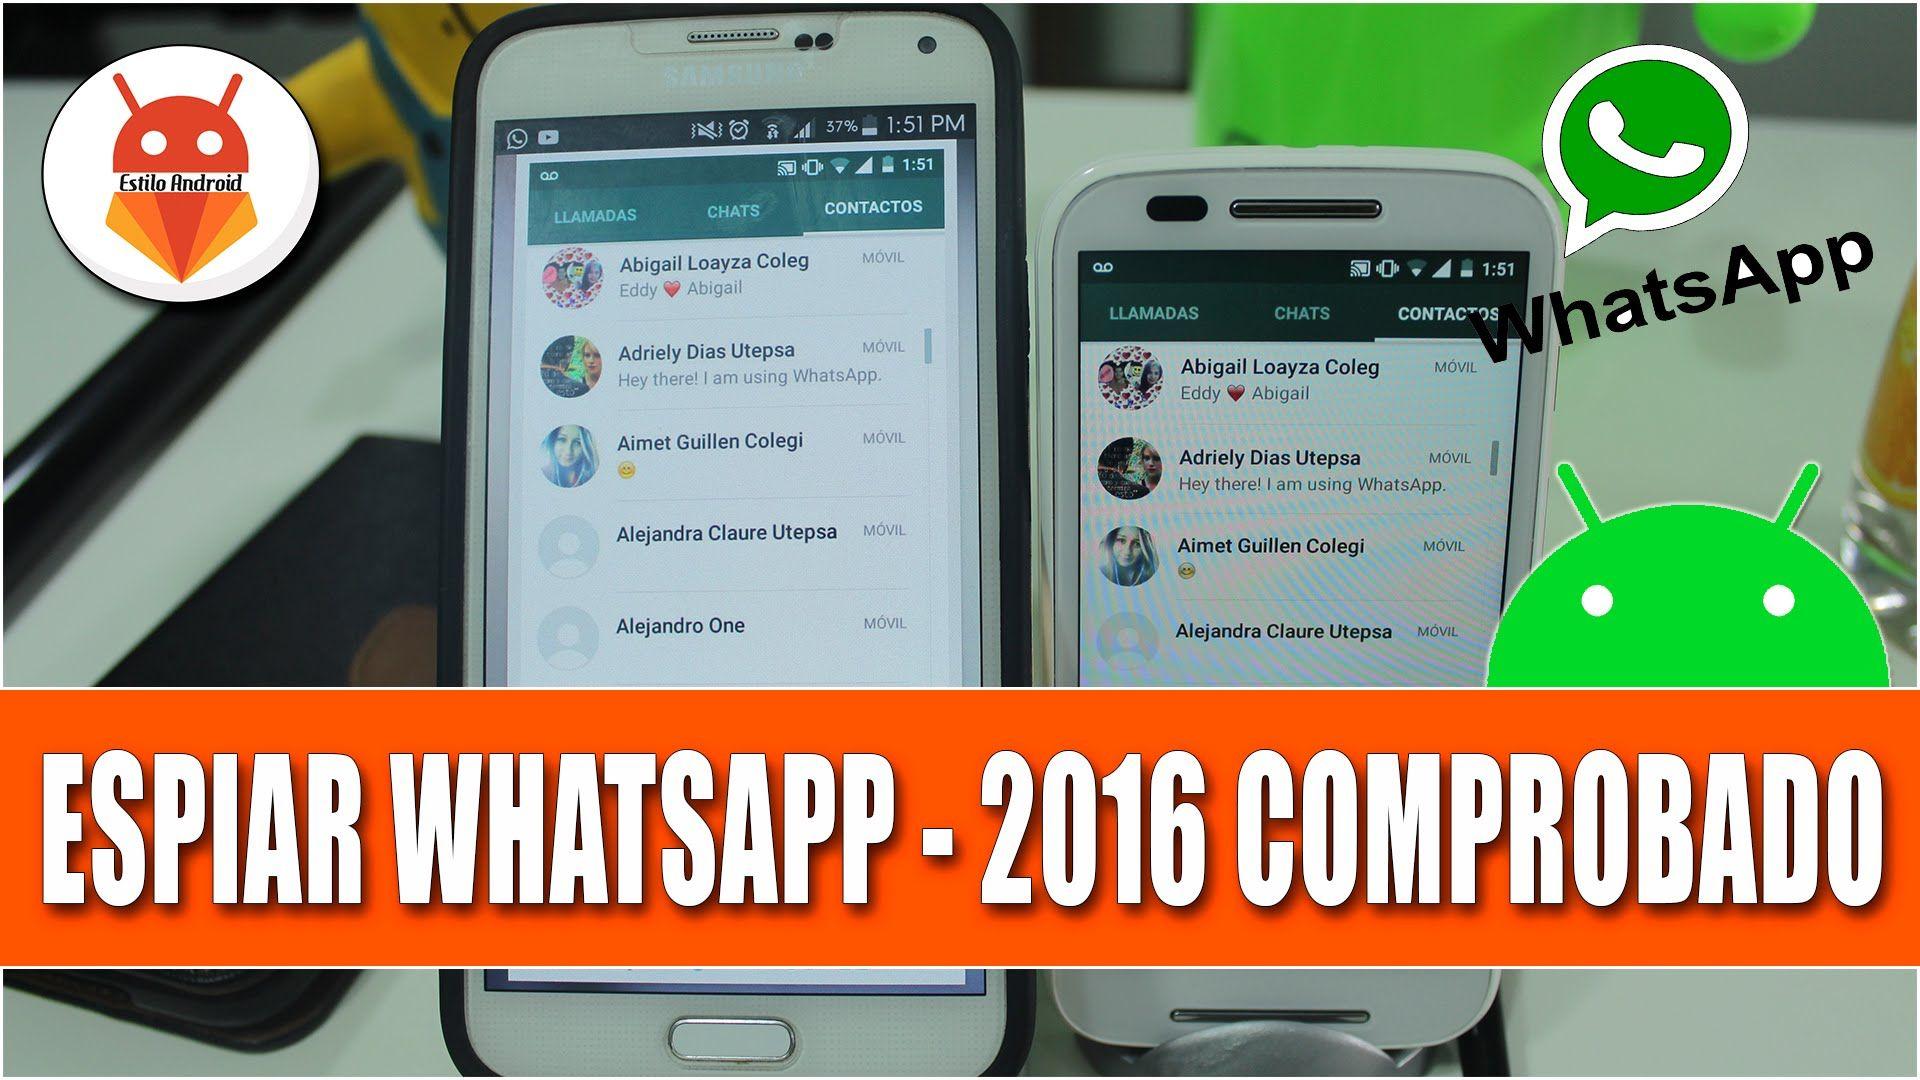 aplicacion para espiar whatsapp blackberry gratis